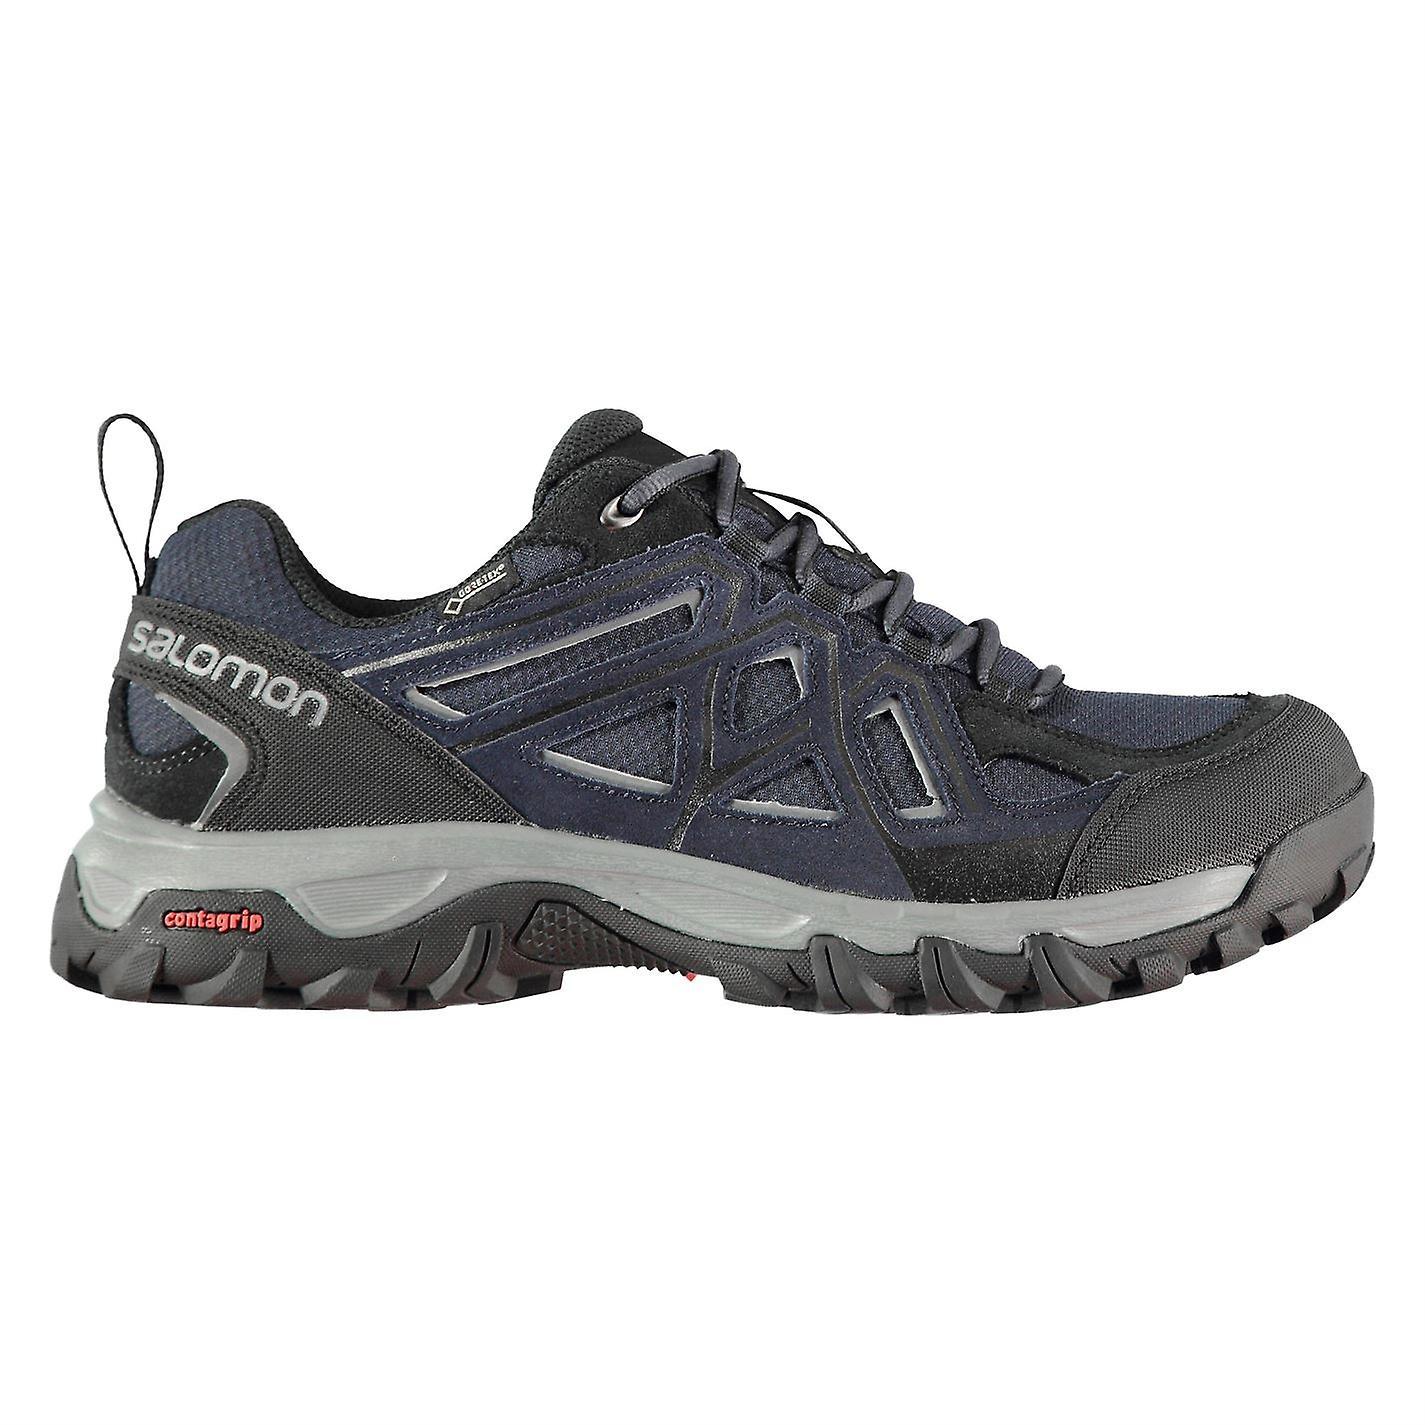 Salomon Herren Evasion 2 GTX Walking Schuhe